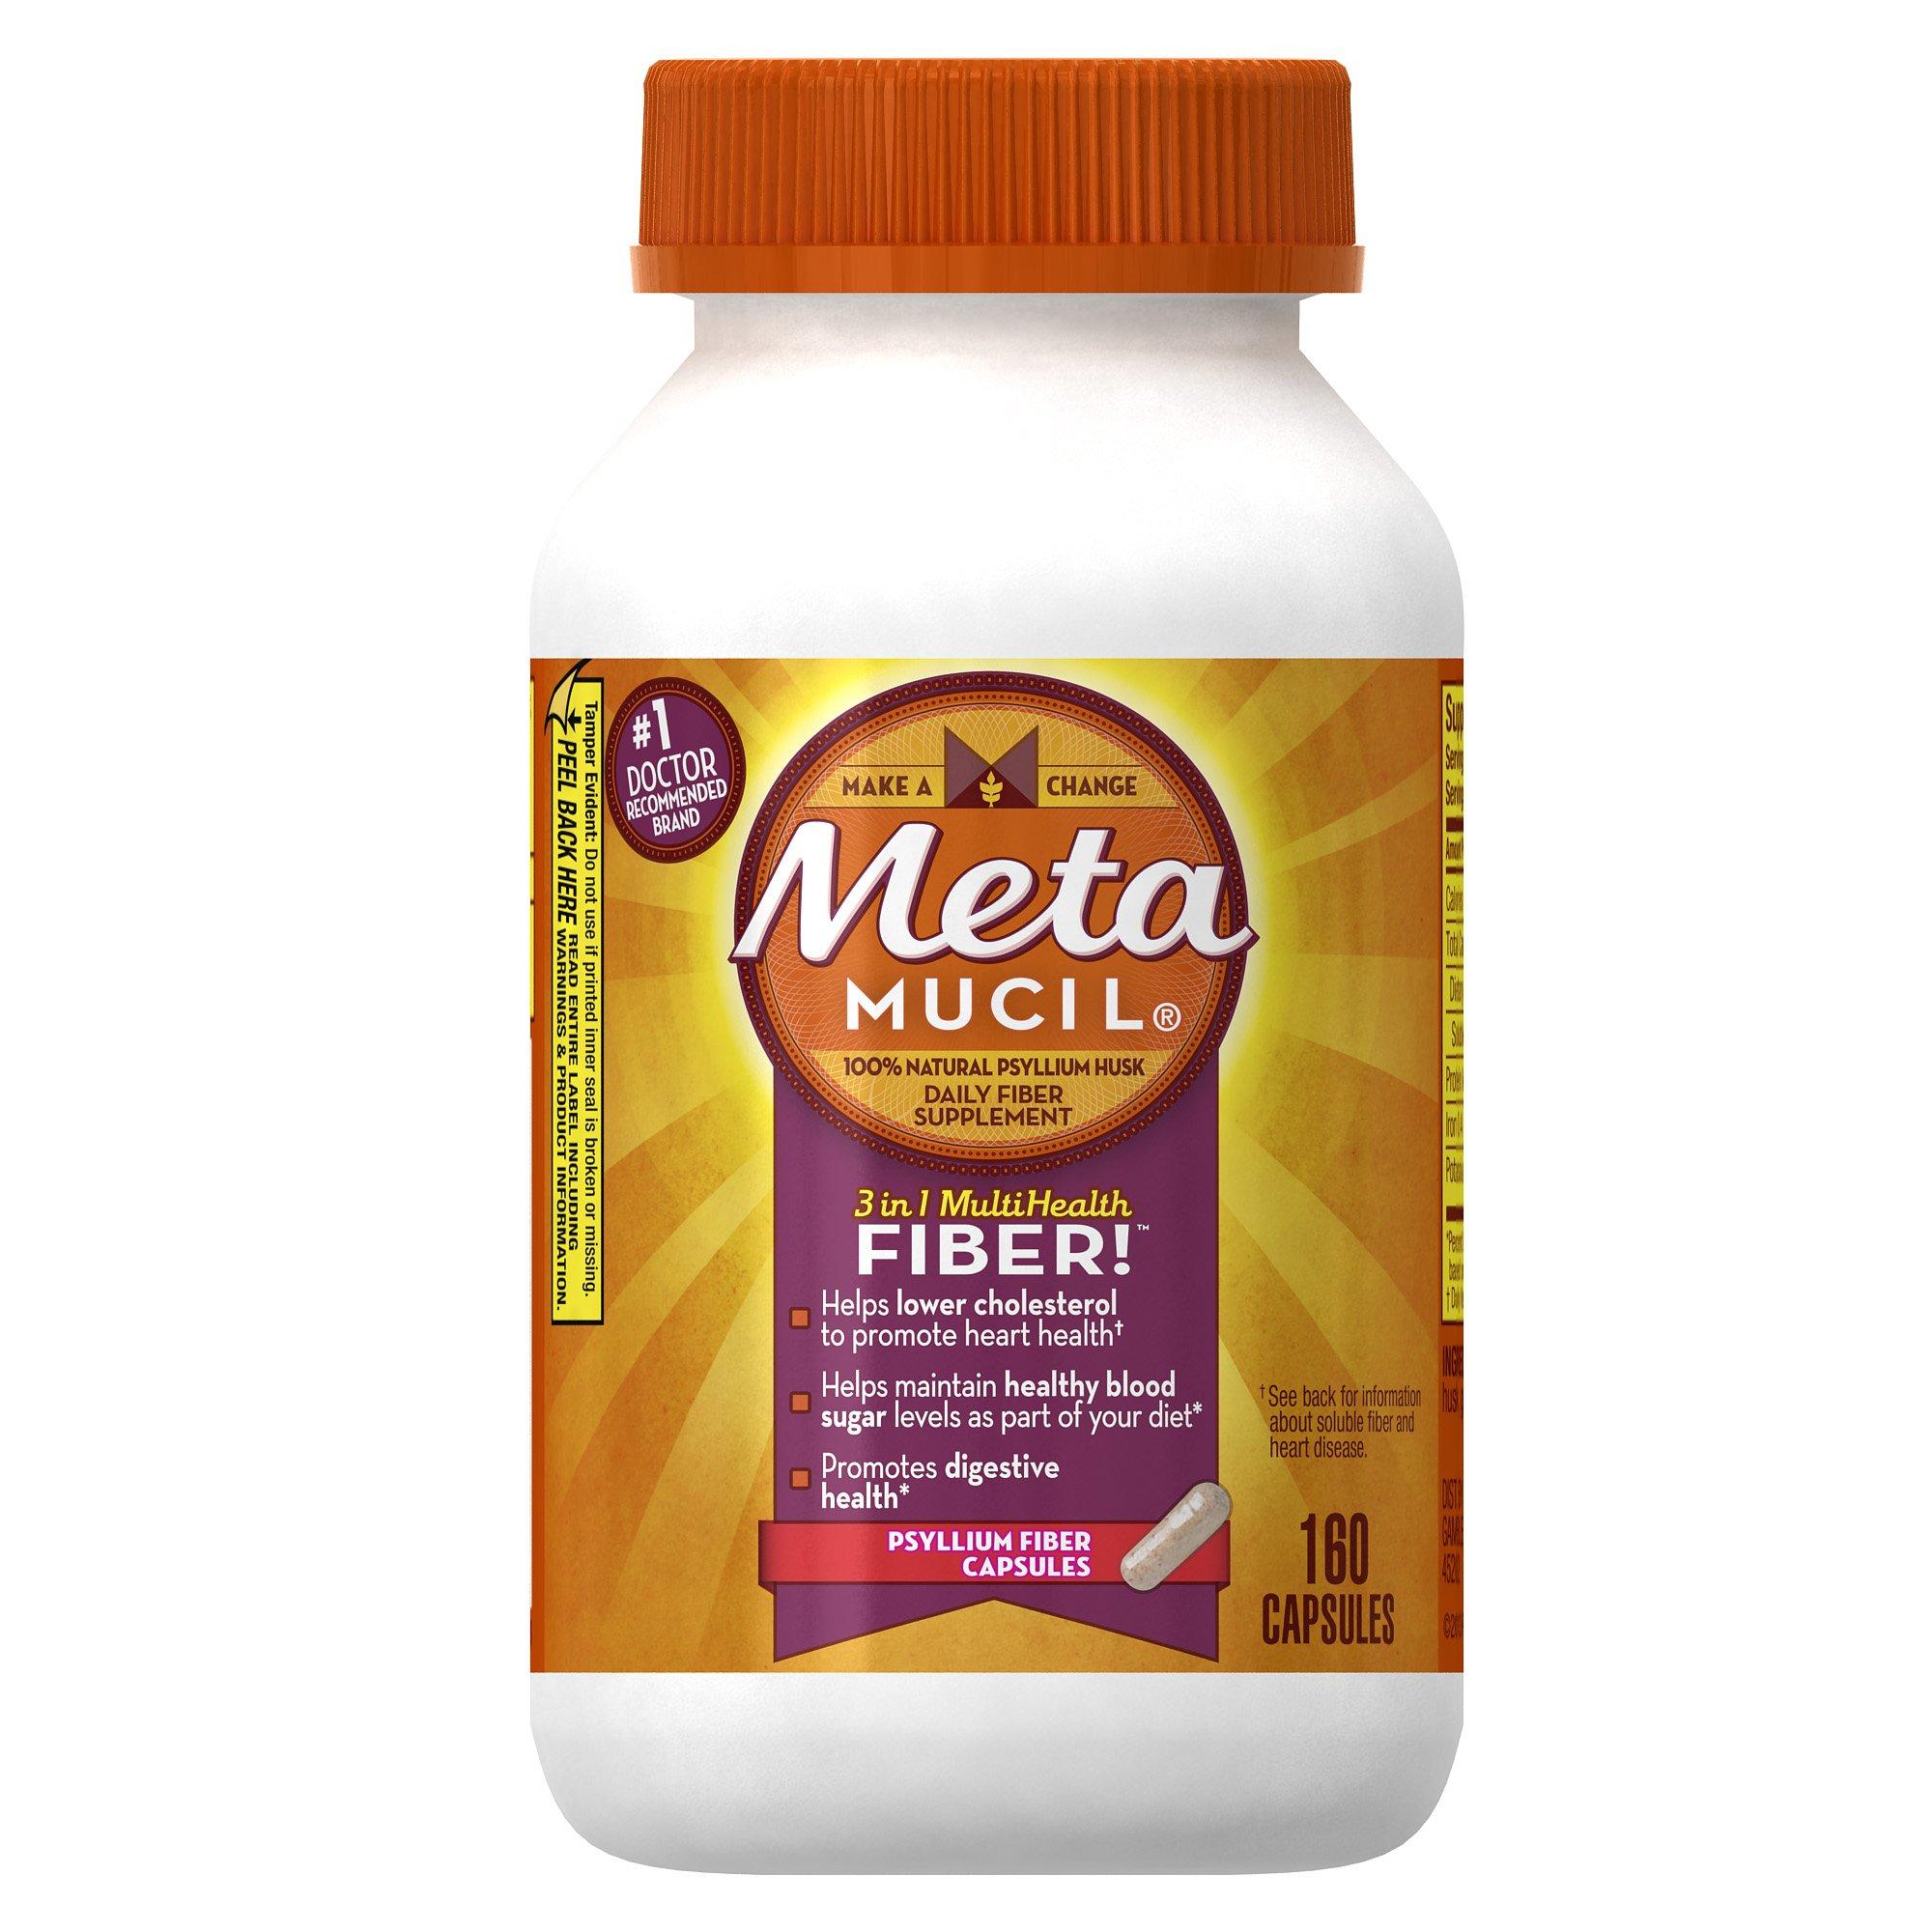 Metamucil Daily Fiber Supplement, Psyllium Husk Capsules, 160 Capsules